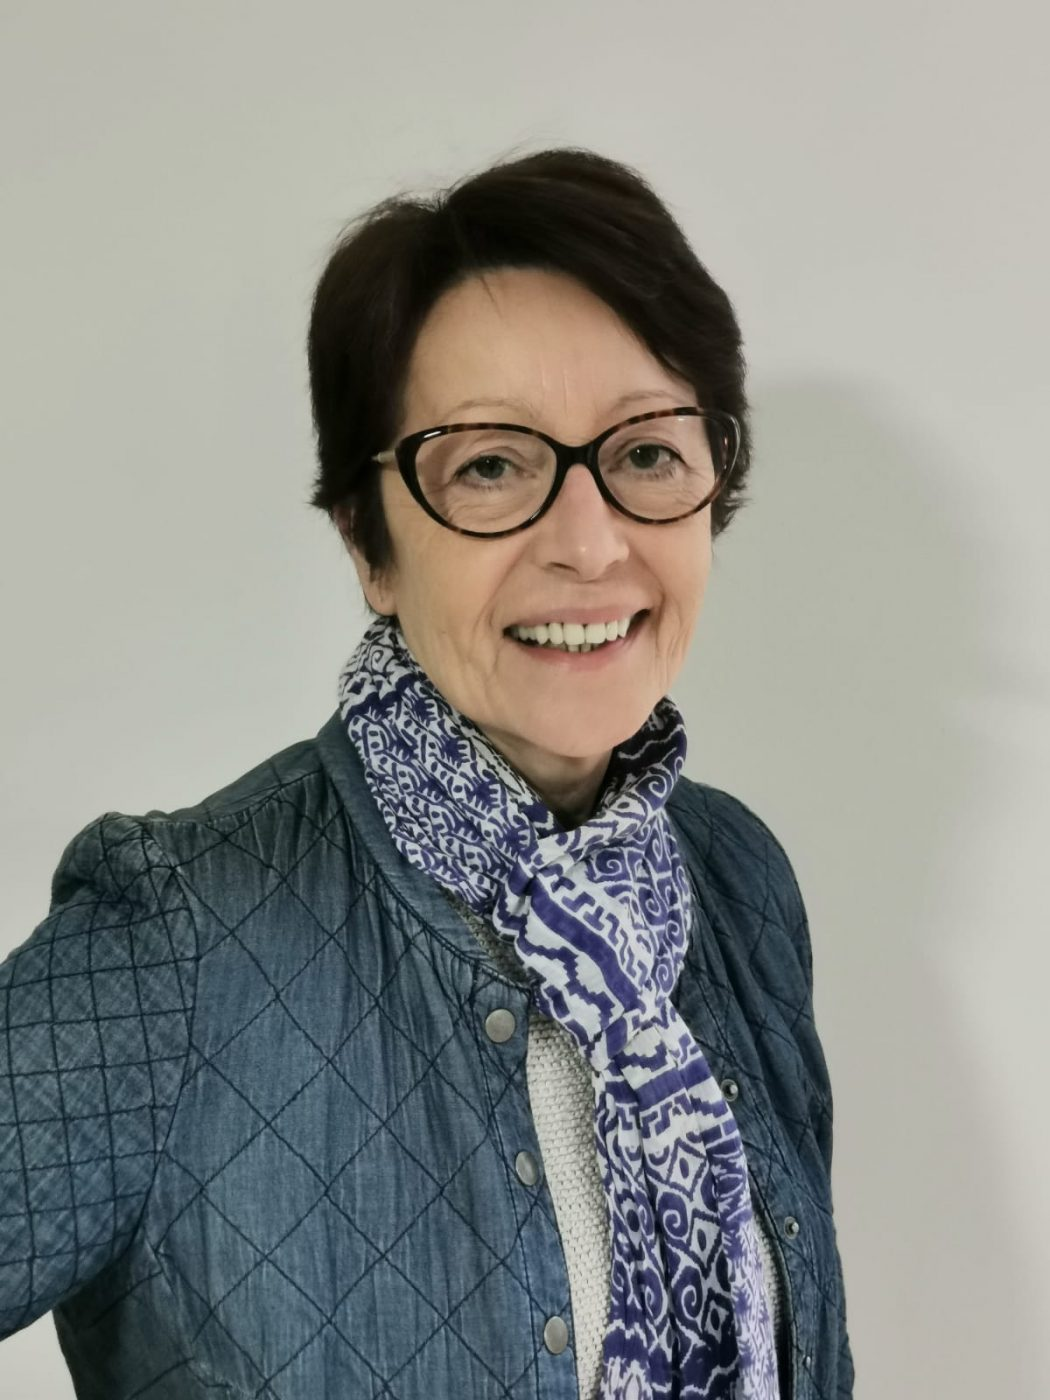 Marie-Claire Carnuccini